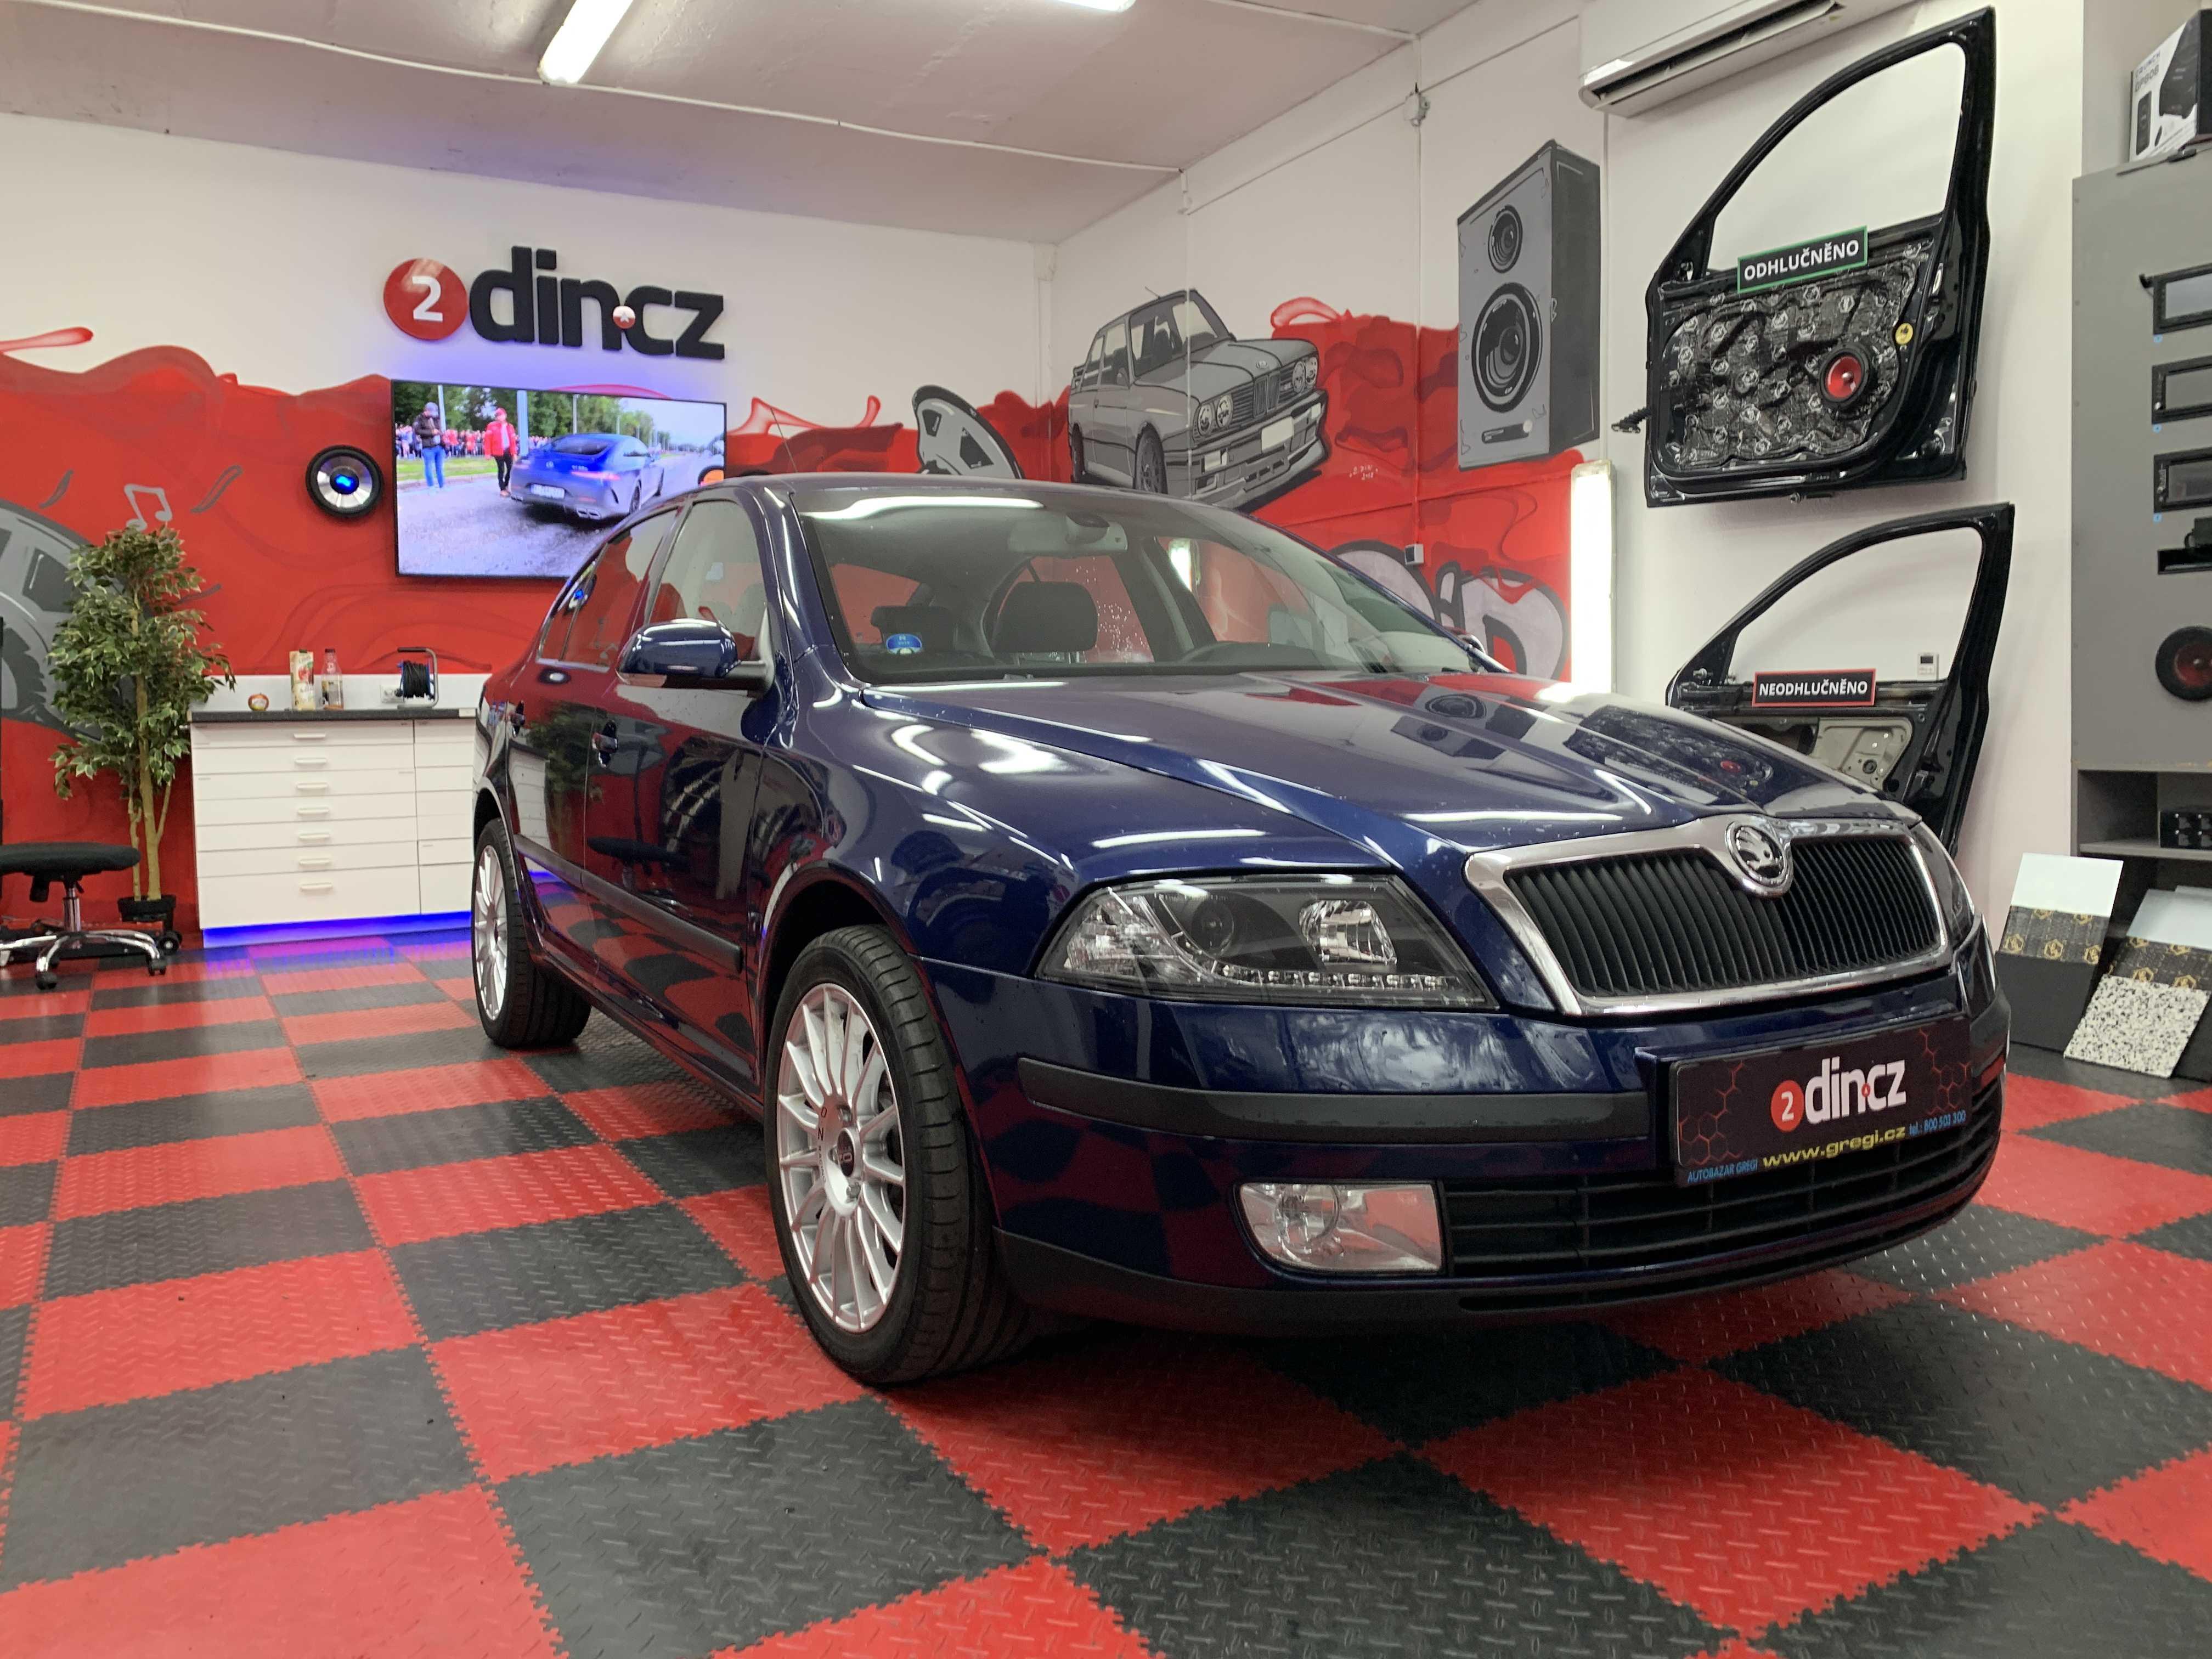 Škoda Octavia II - Montáž rádia Macrom